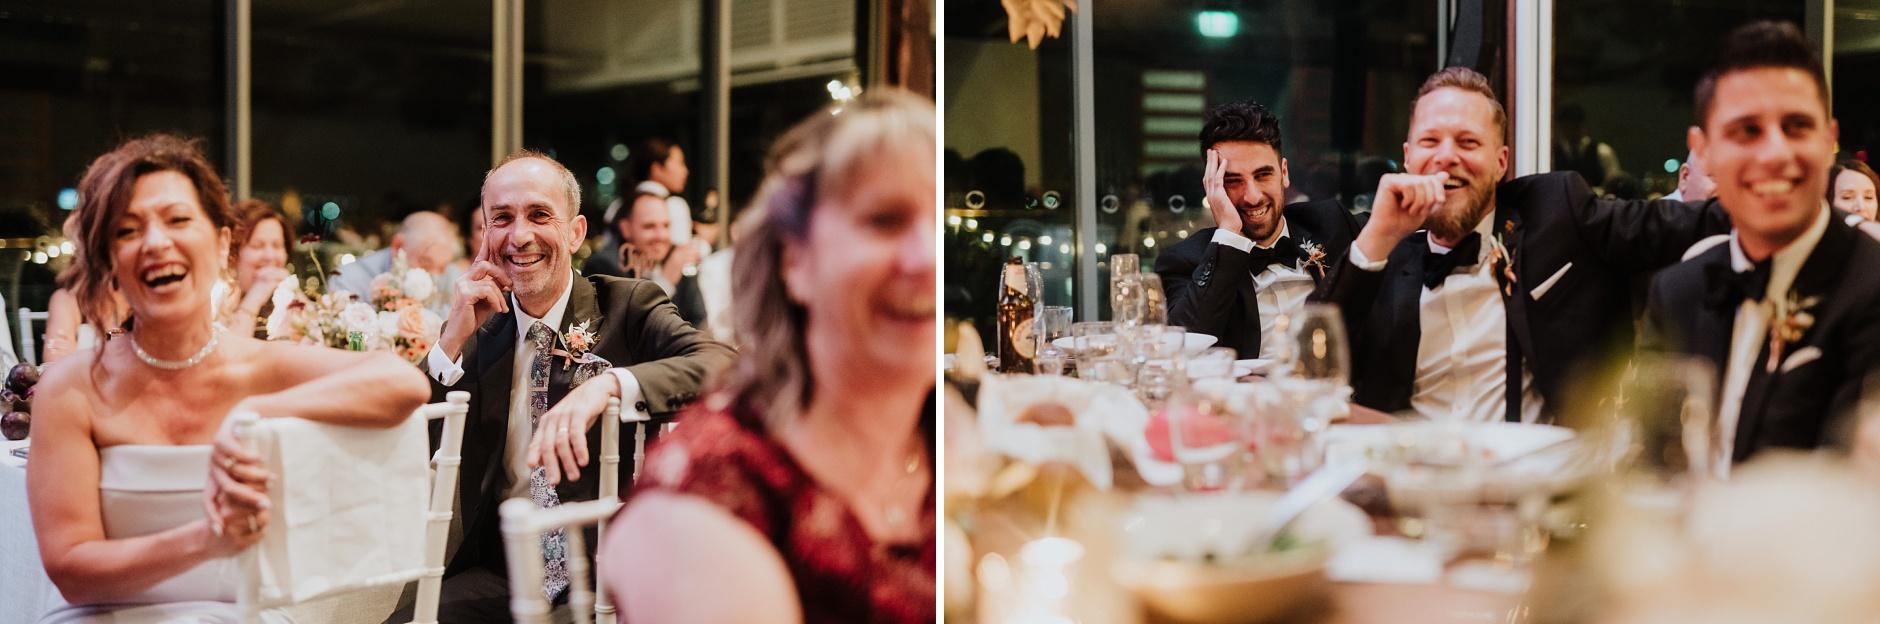 Sydney-Wedding-Photographer_0168.jpg